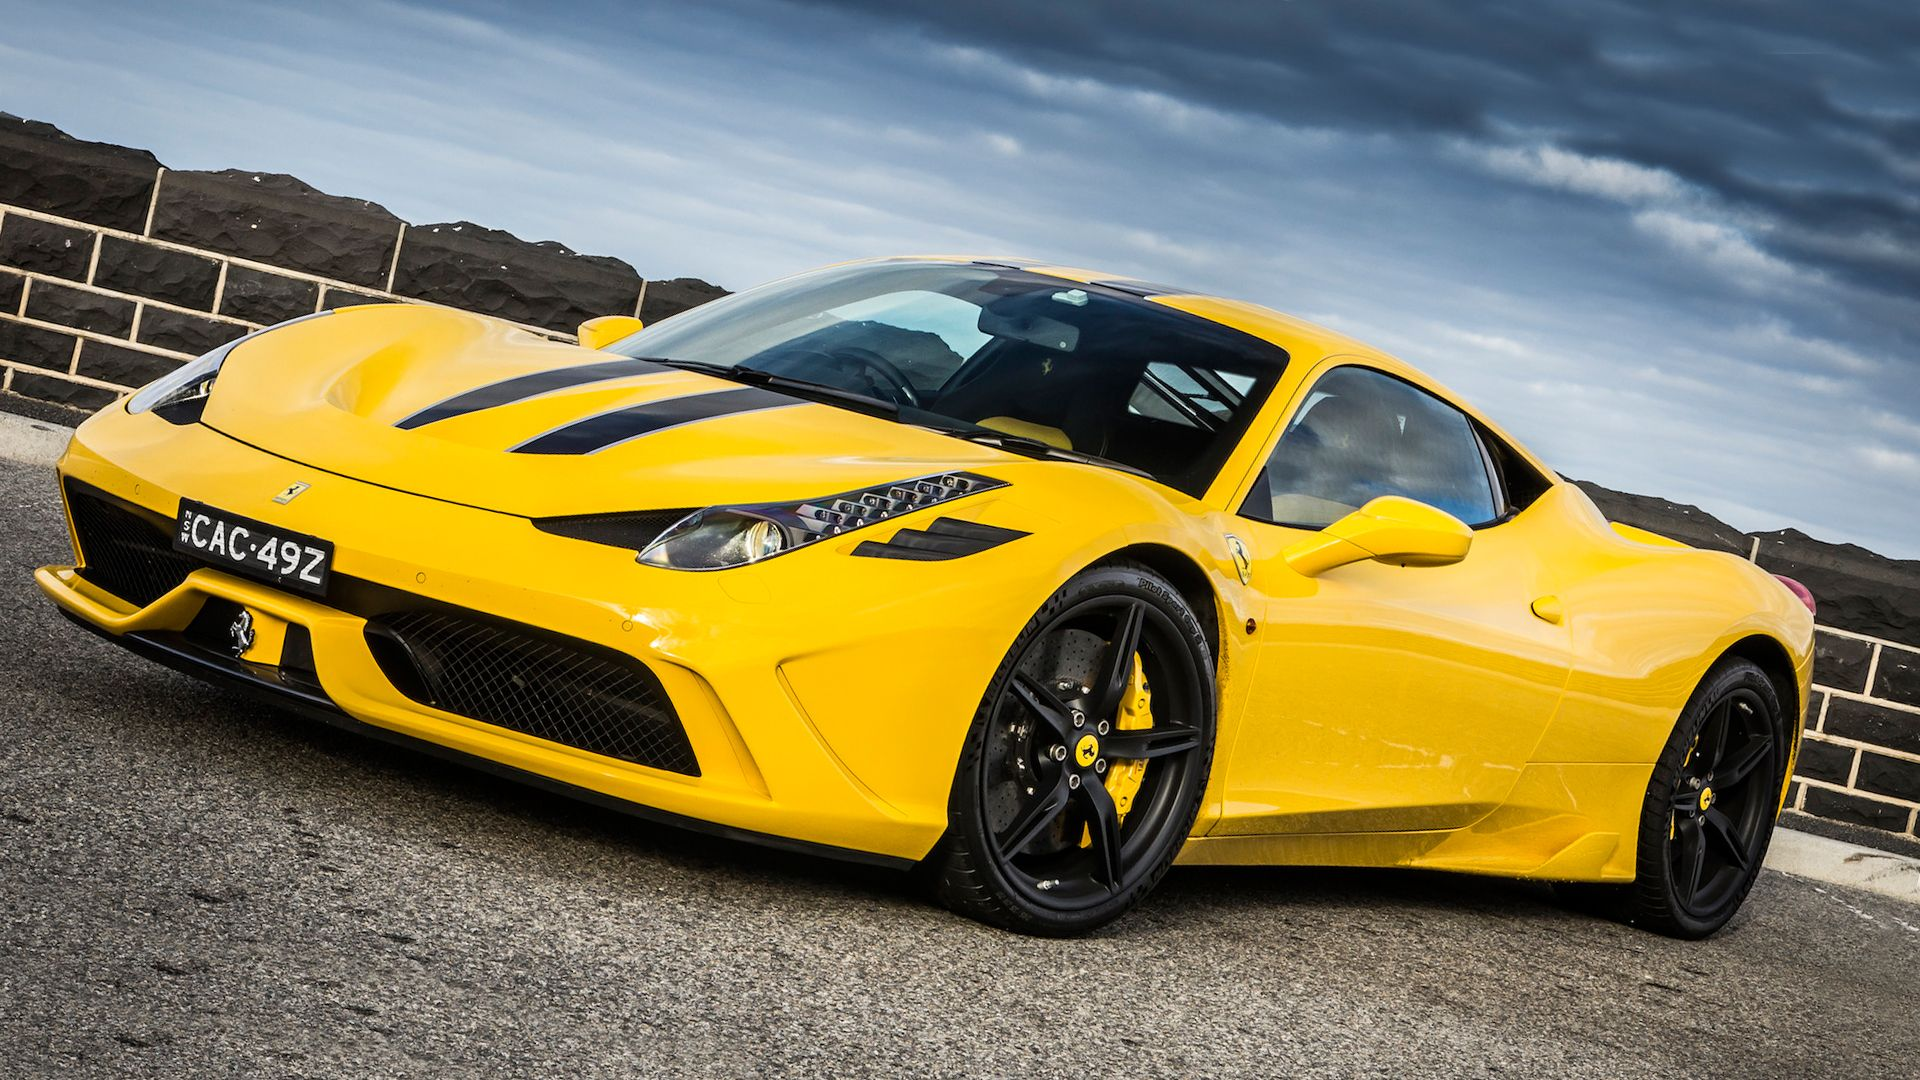 Ferrari 458 Speciale Price >> New 2019 Ferrari 458 Speciale Price Ferrari 458 Ferrari